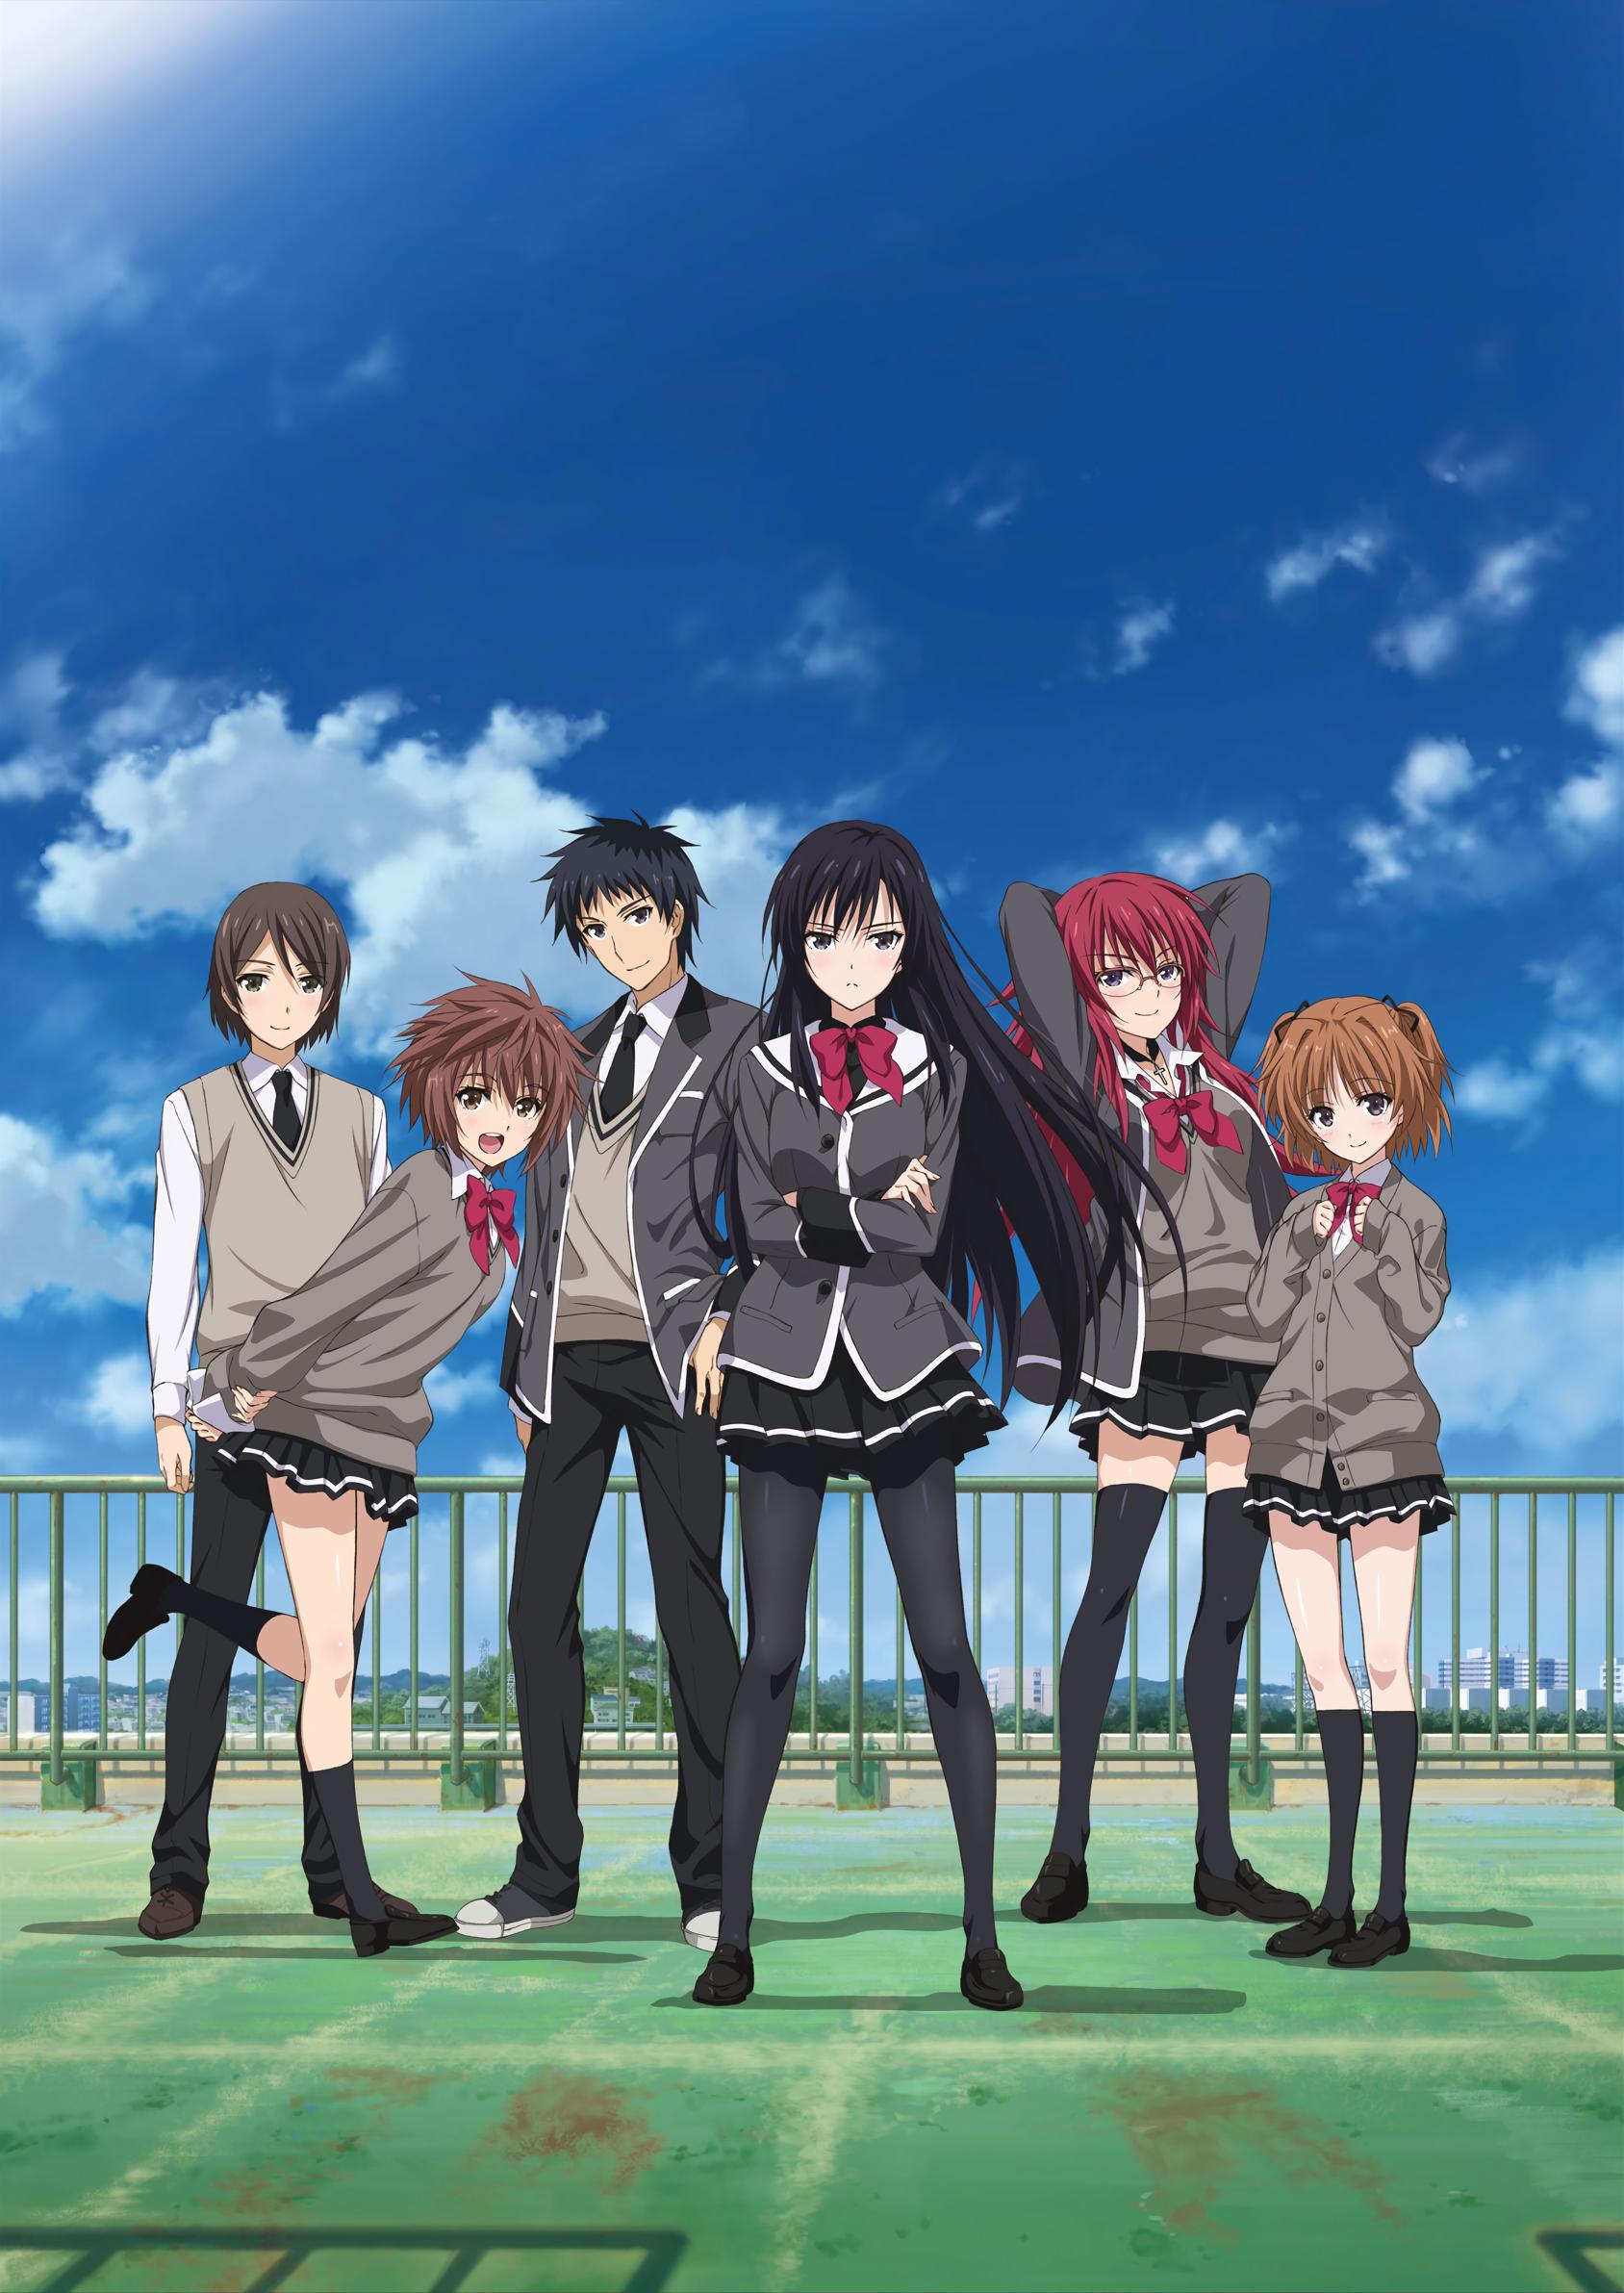 shoujo-tachi wa kouya wo mezasu anime visual